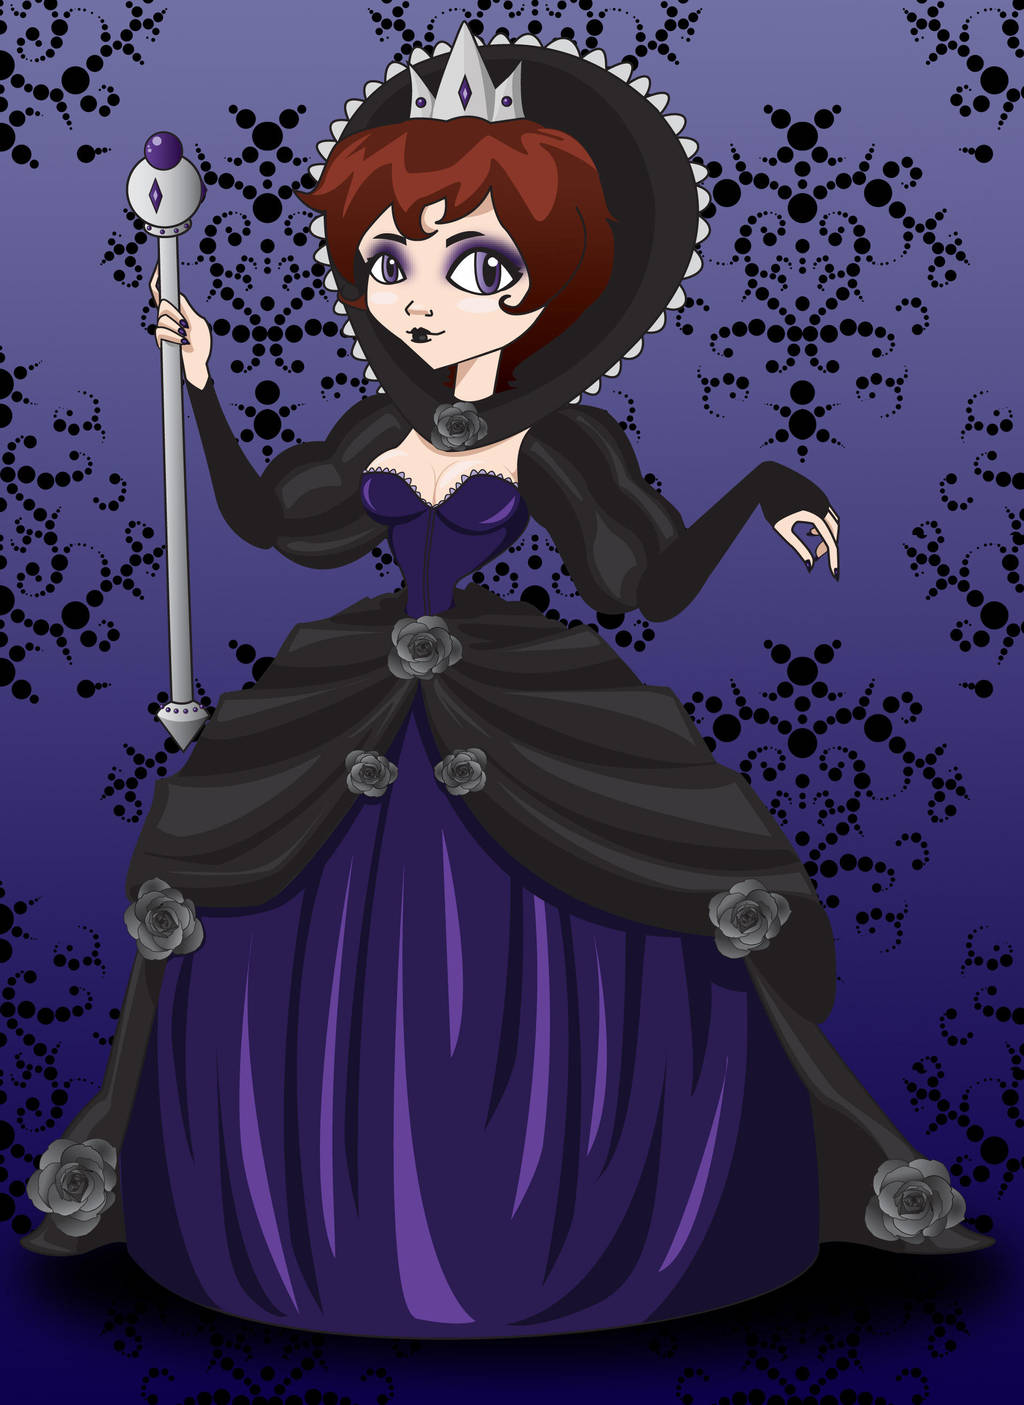 The Black Queen by IndigoFlamingo